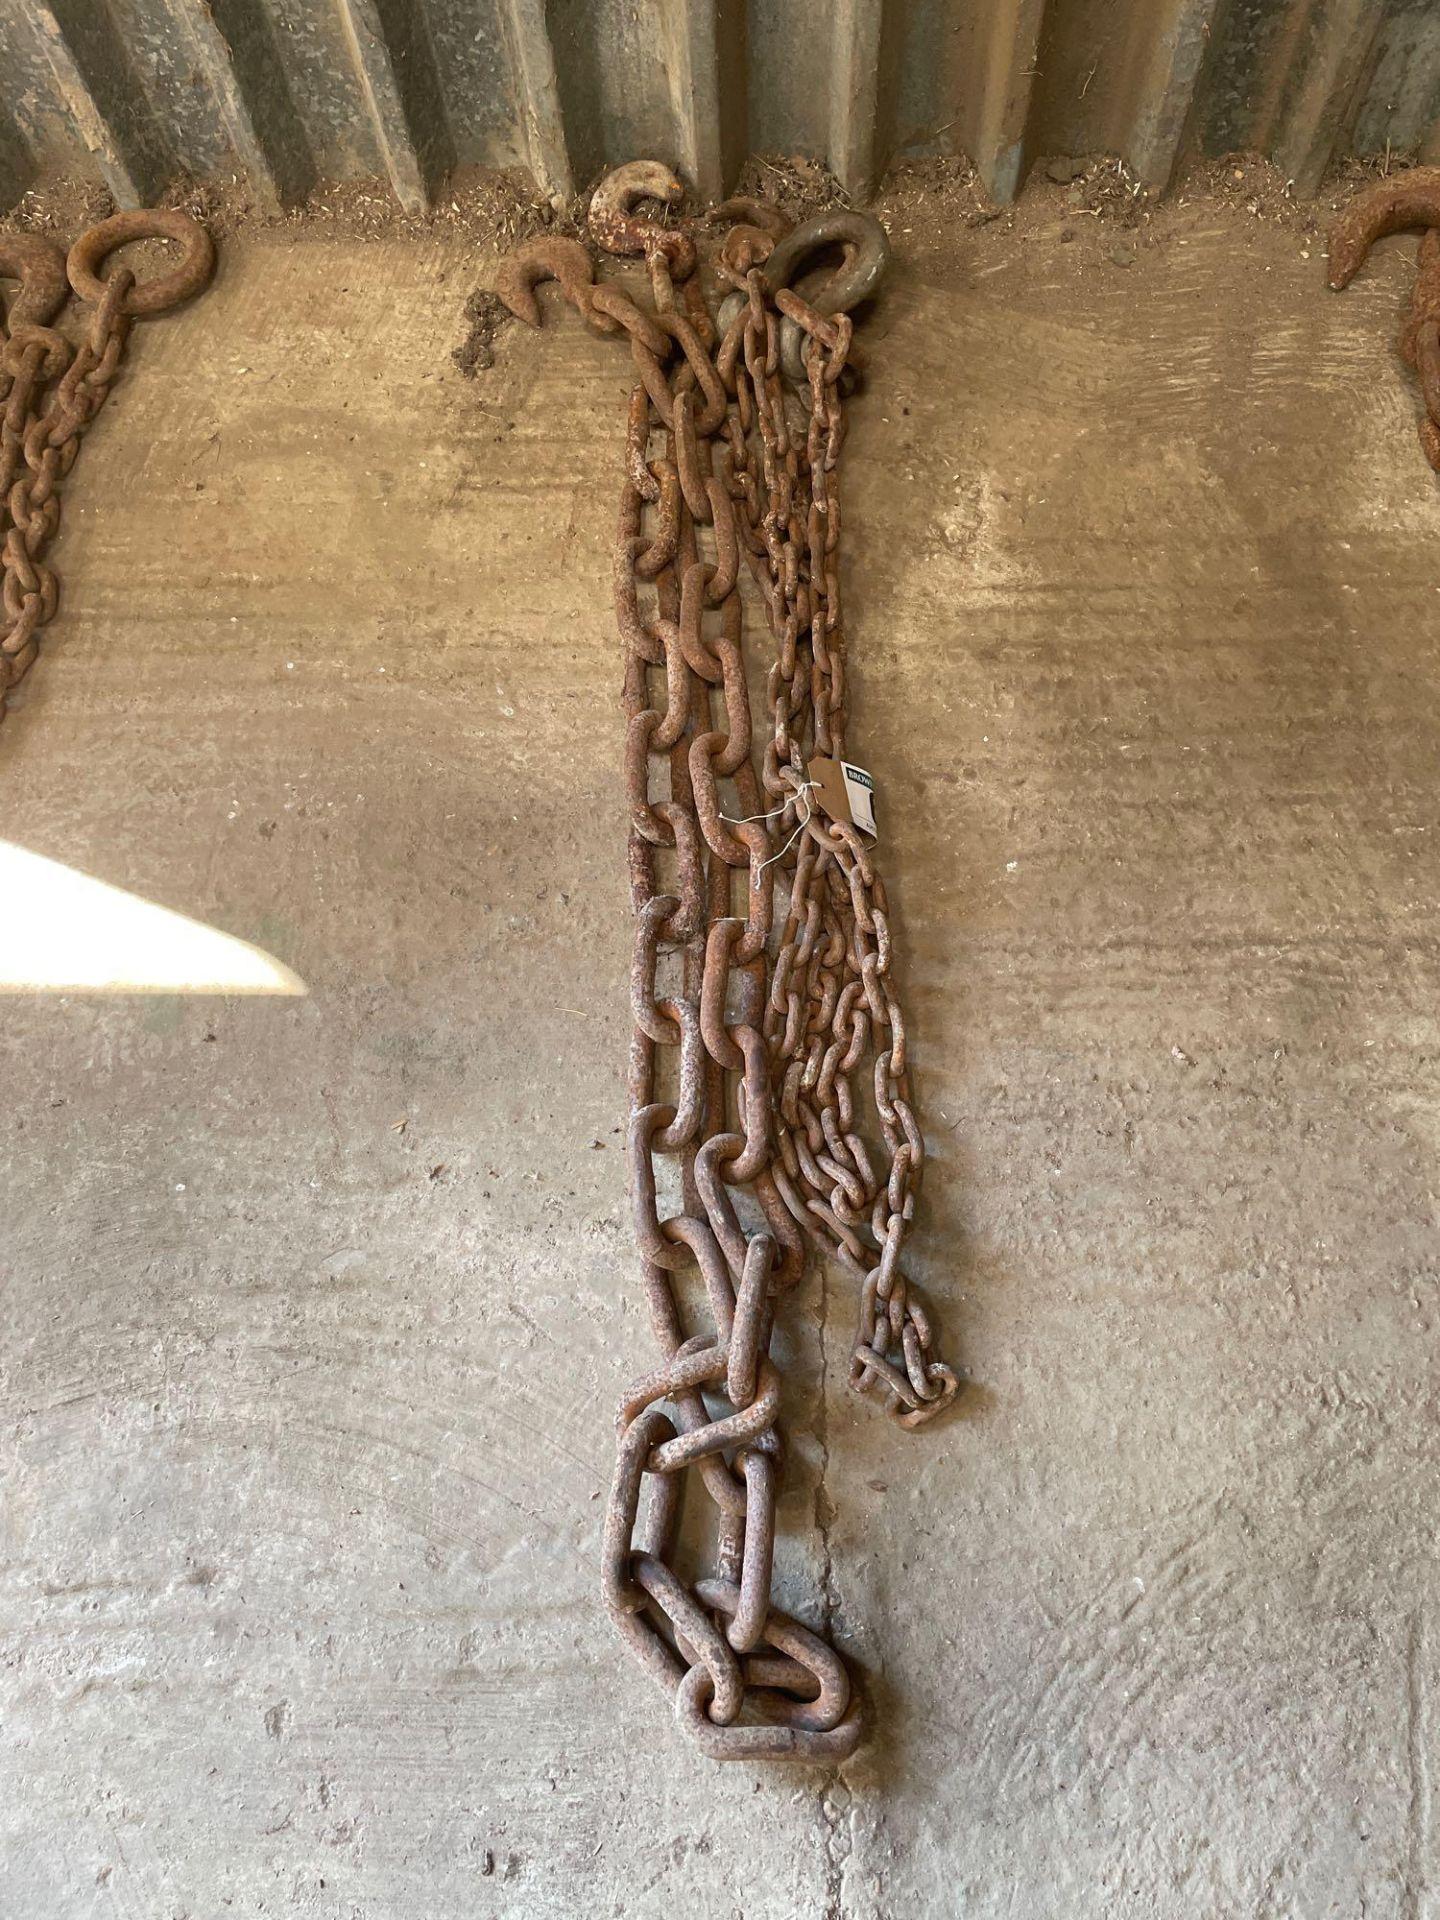 Quantity chains